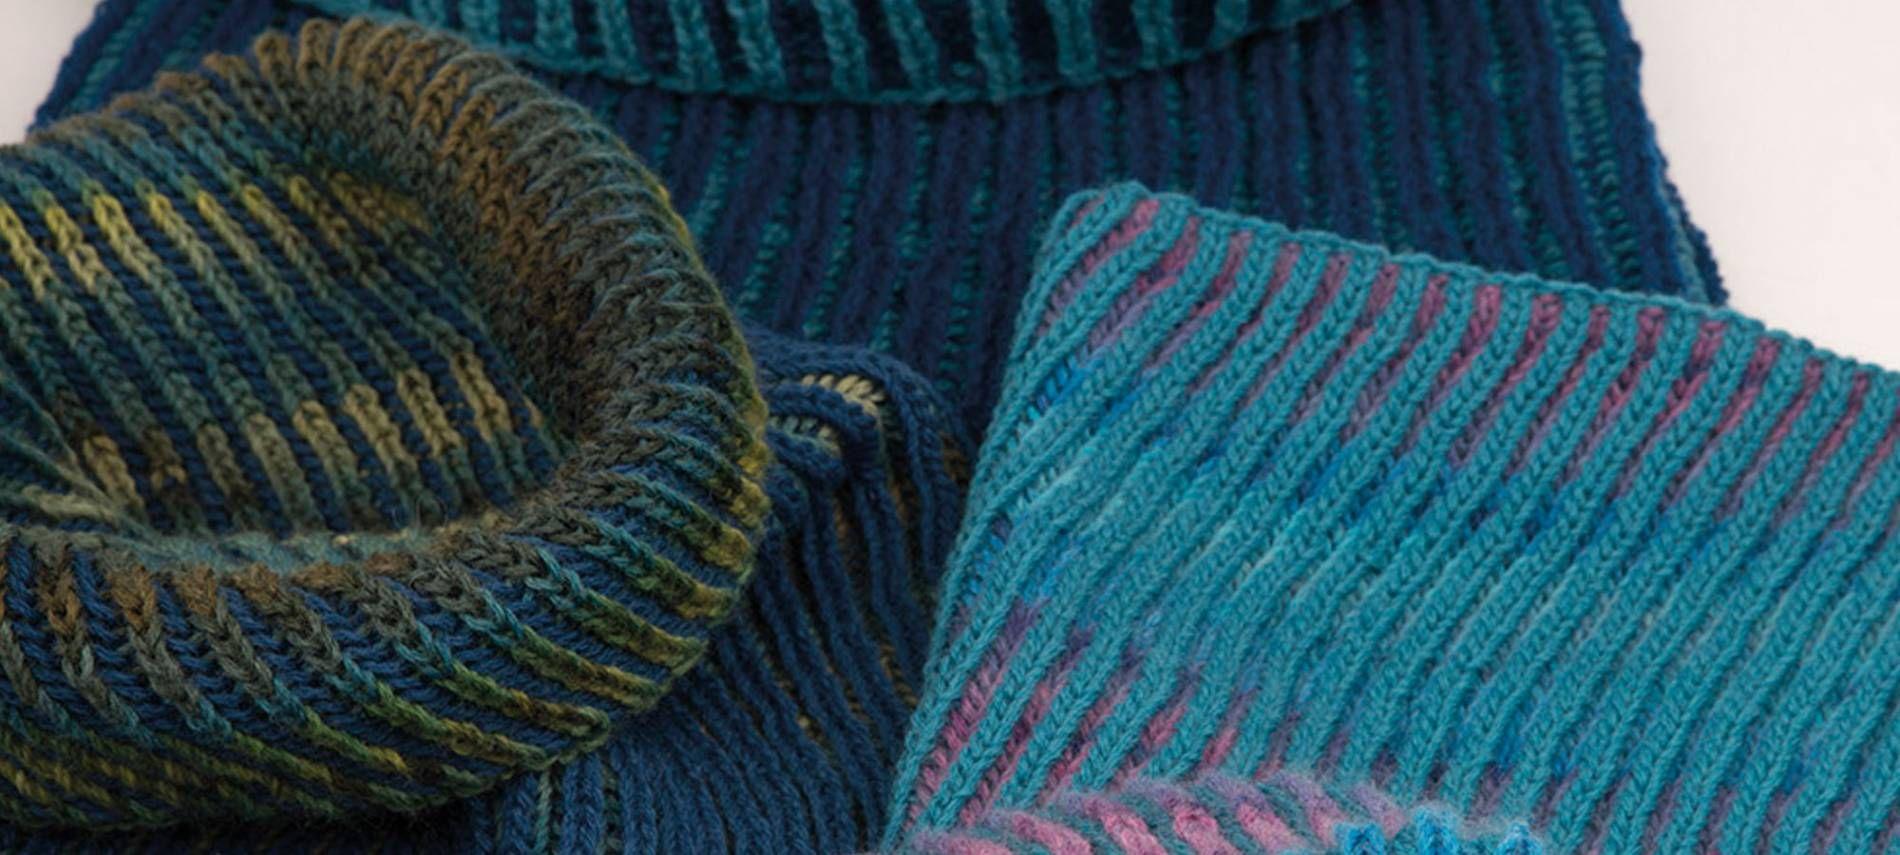 Photo of Strickanleitung Patentmuster in zwei Farben